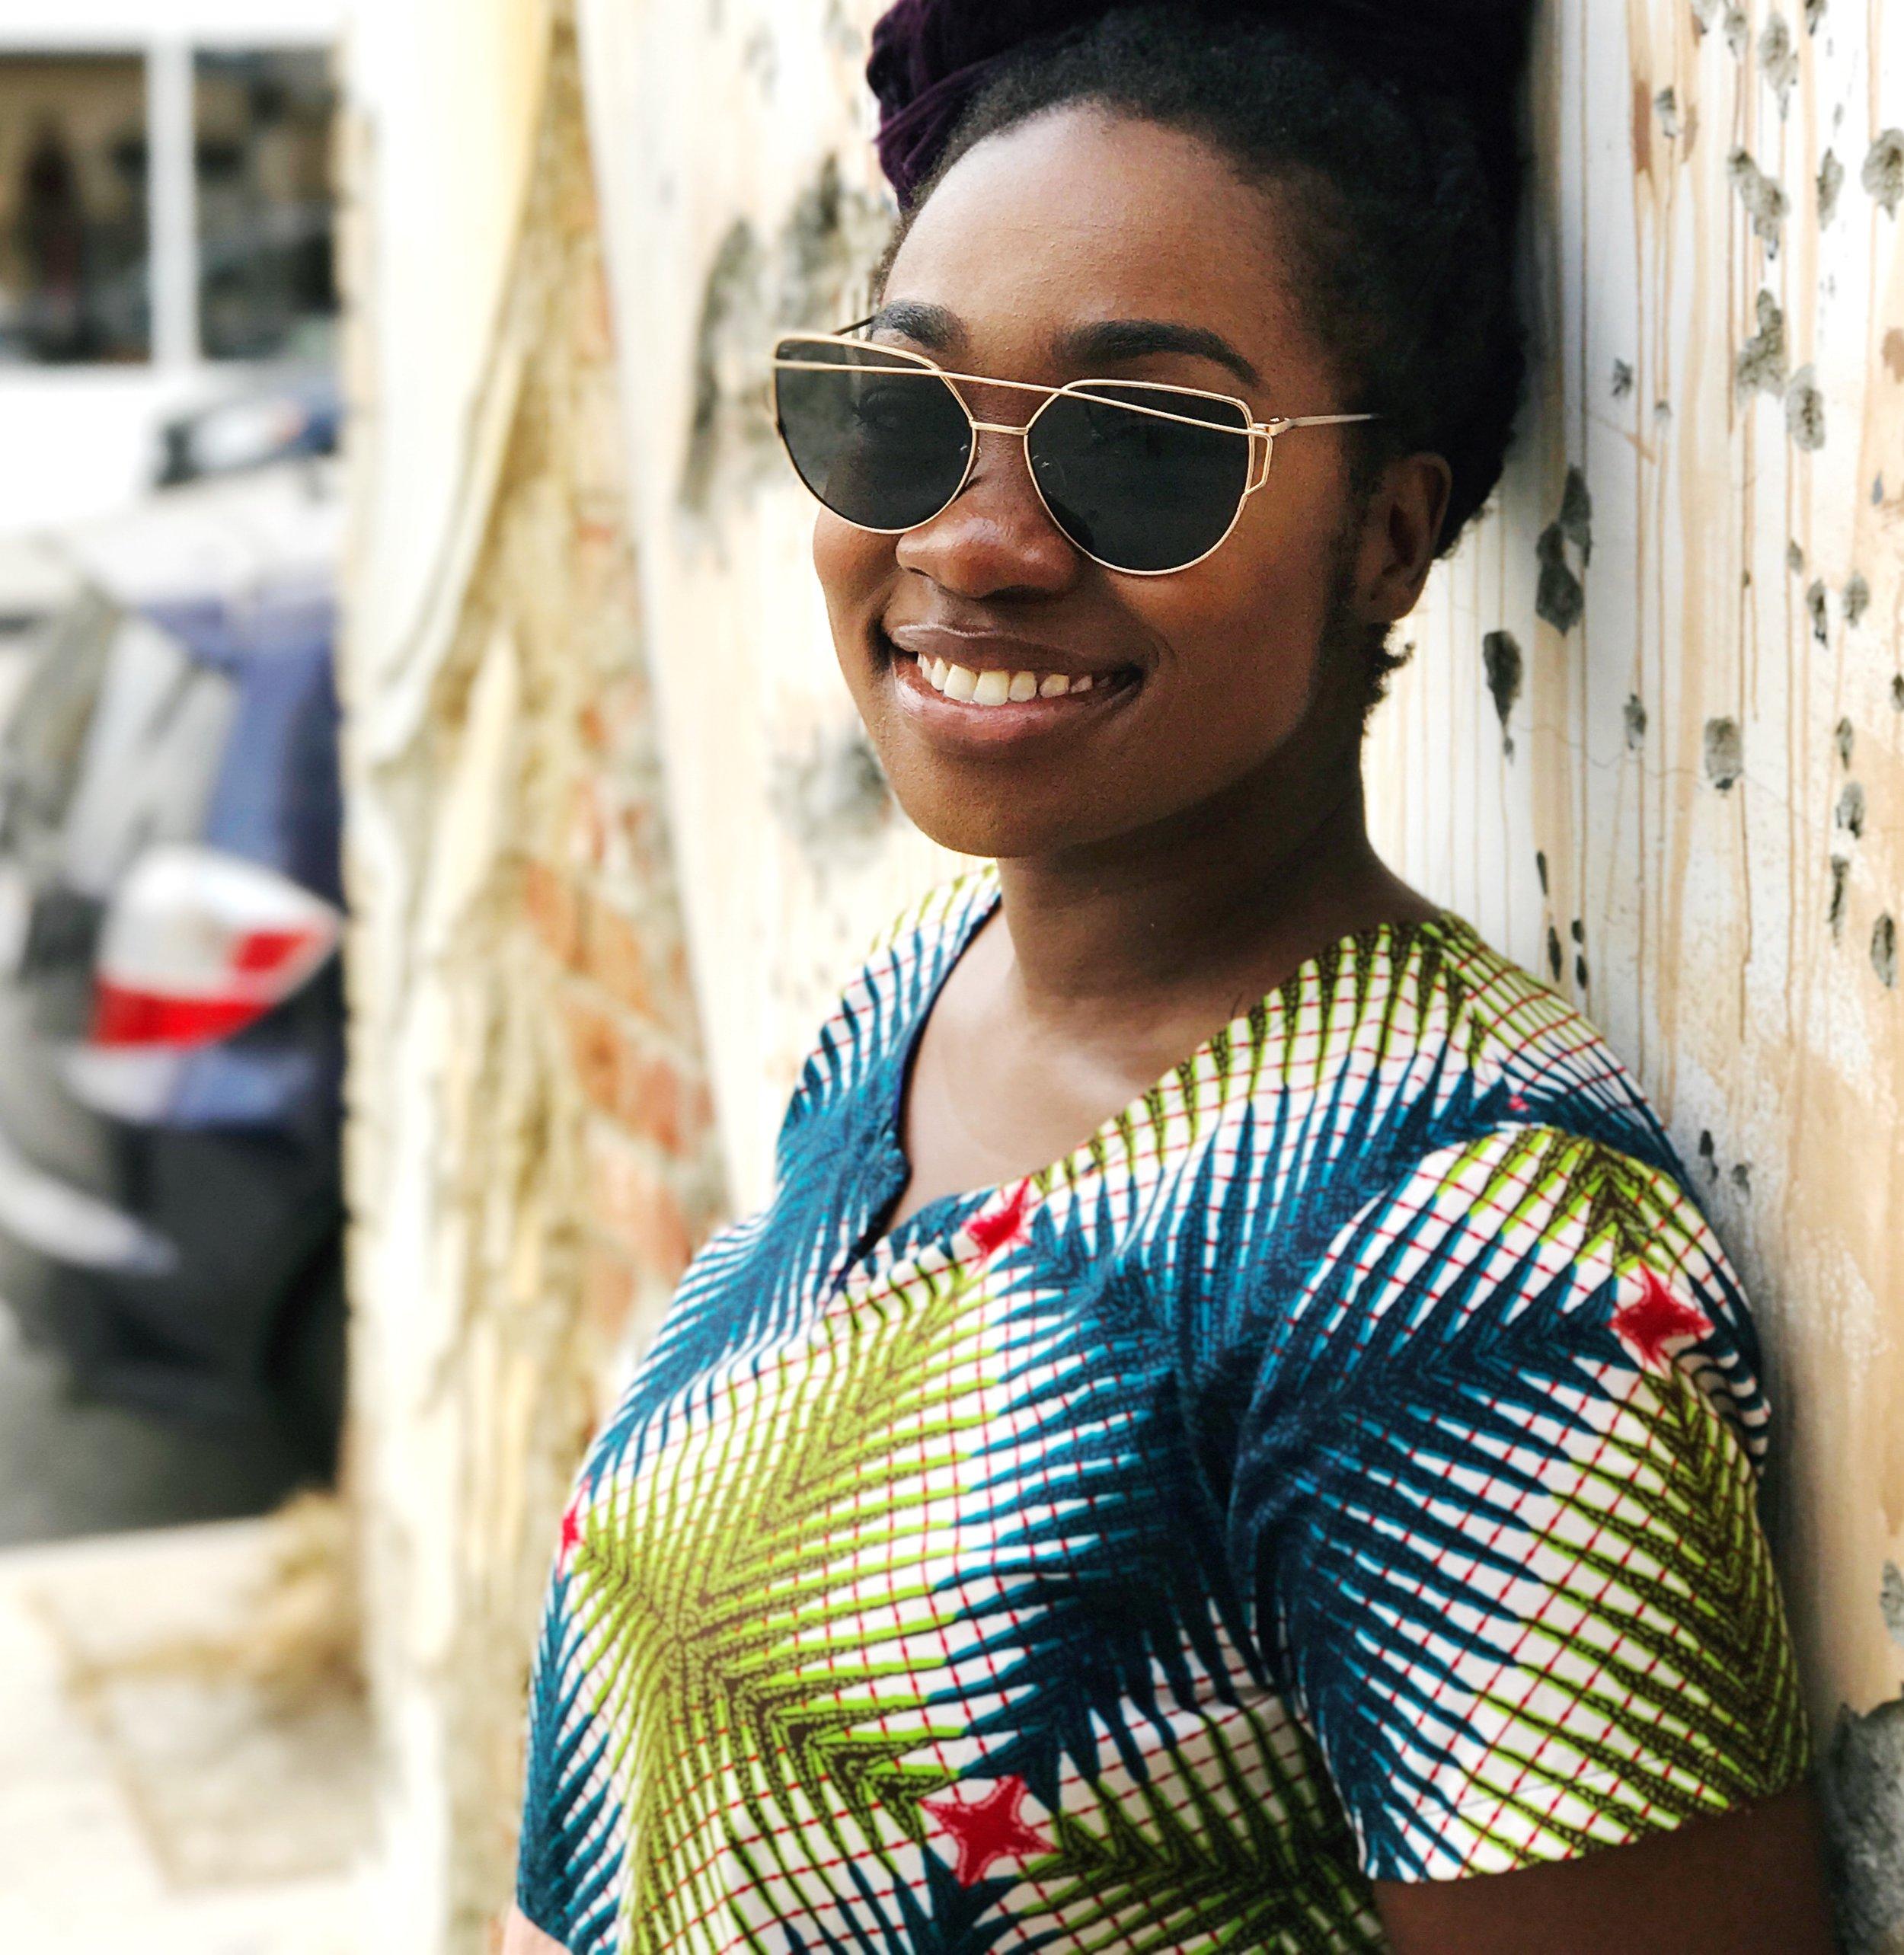 Femi smiling at camera wearing sunglasses and ankara print dress